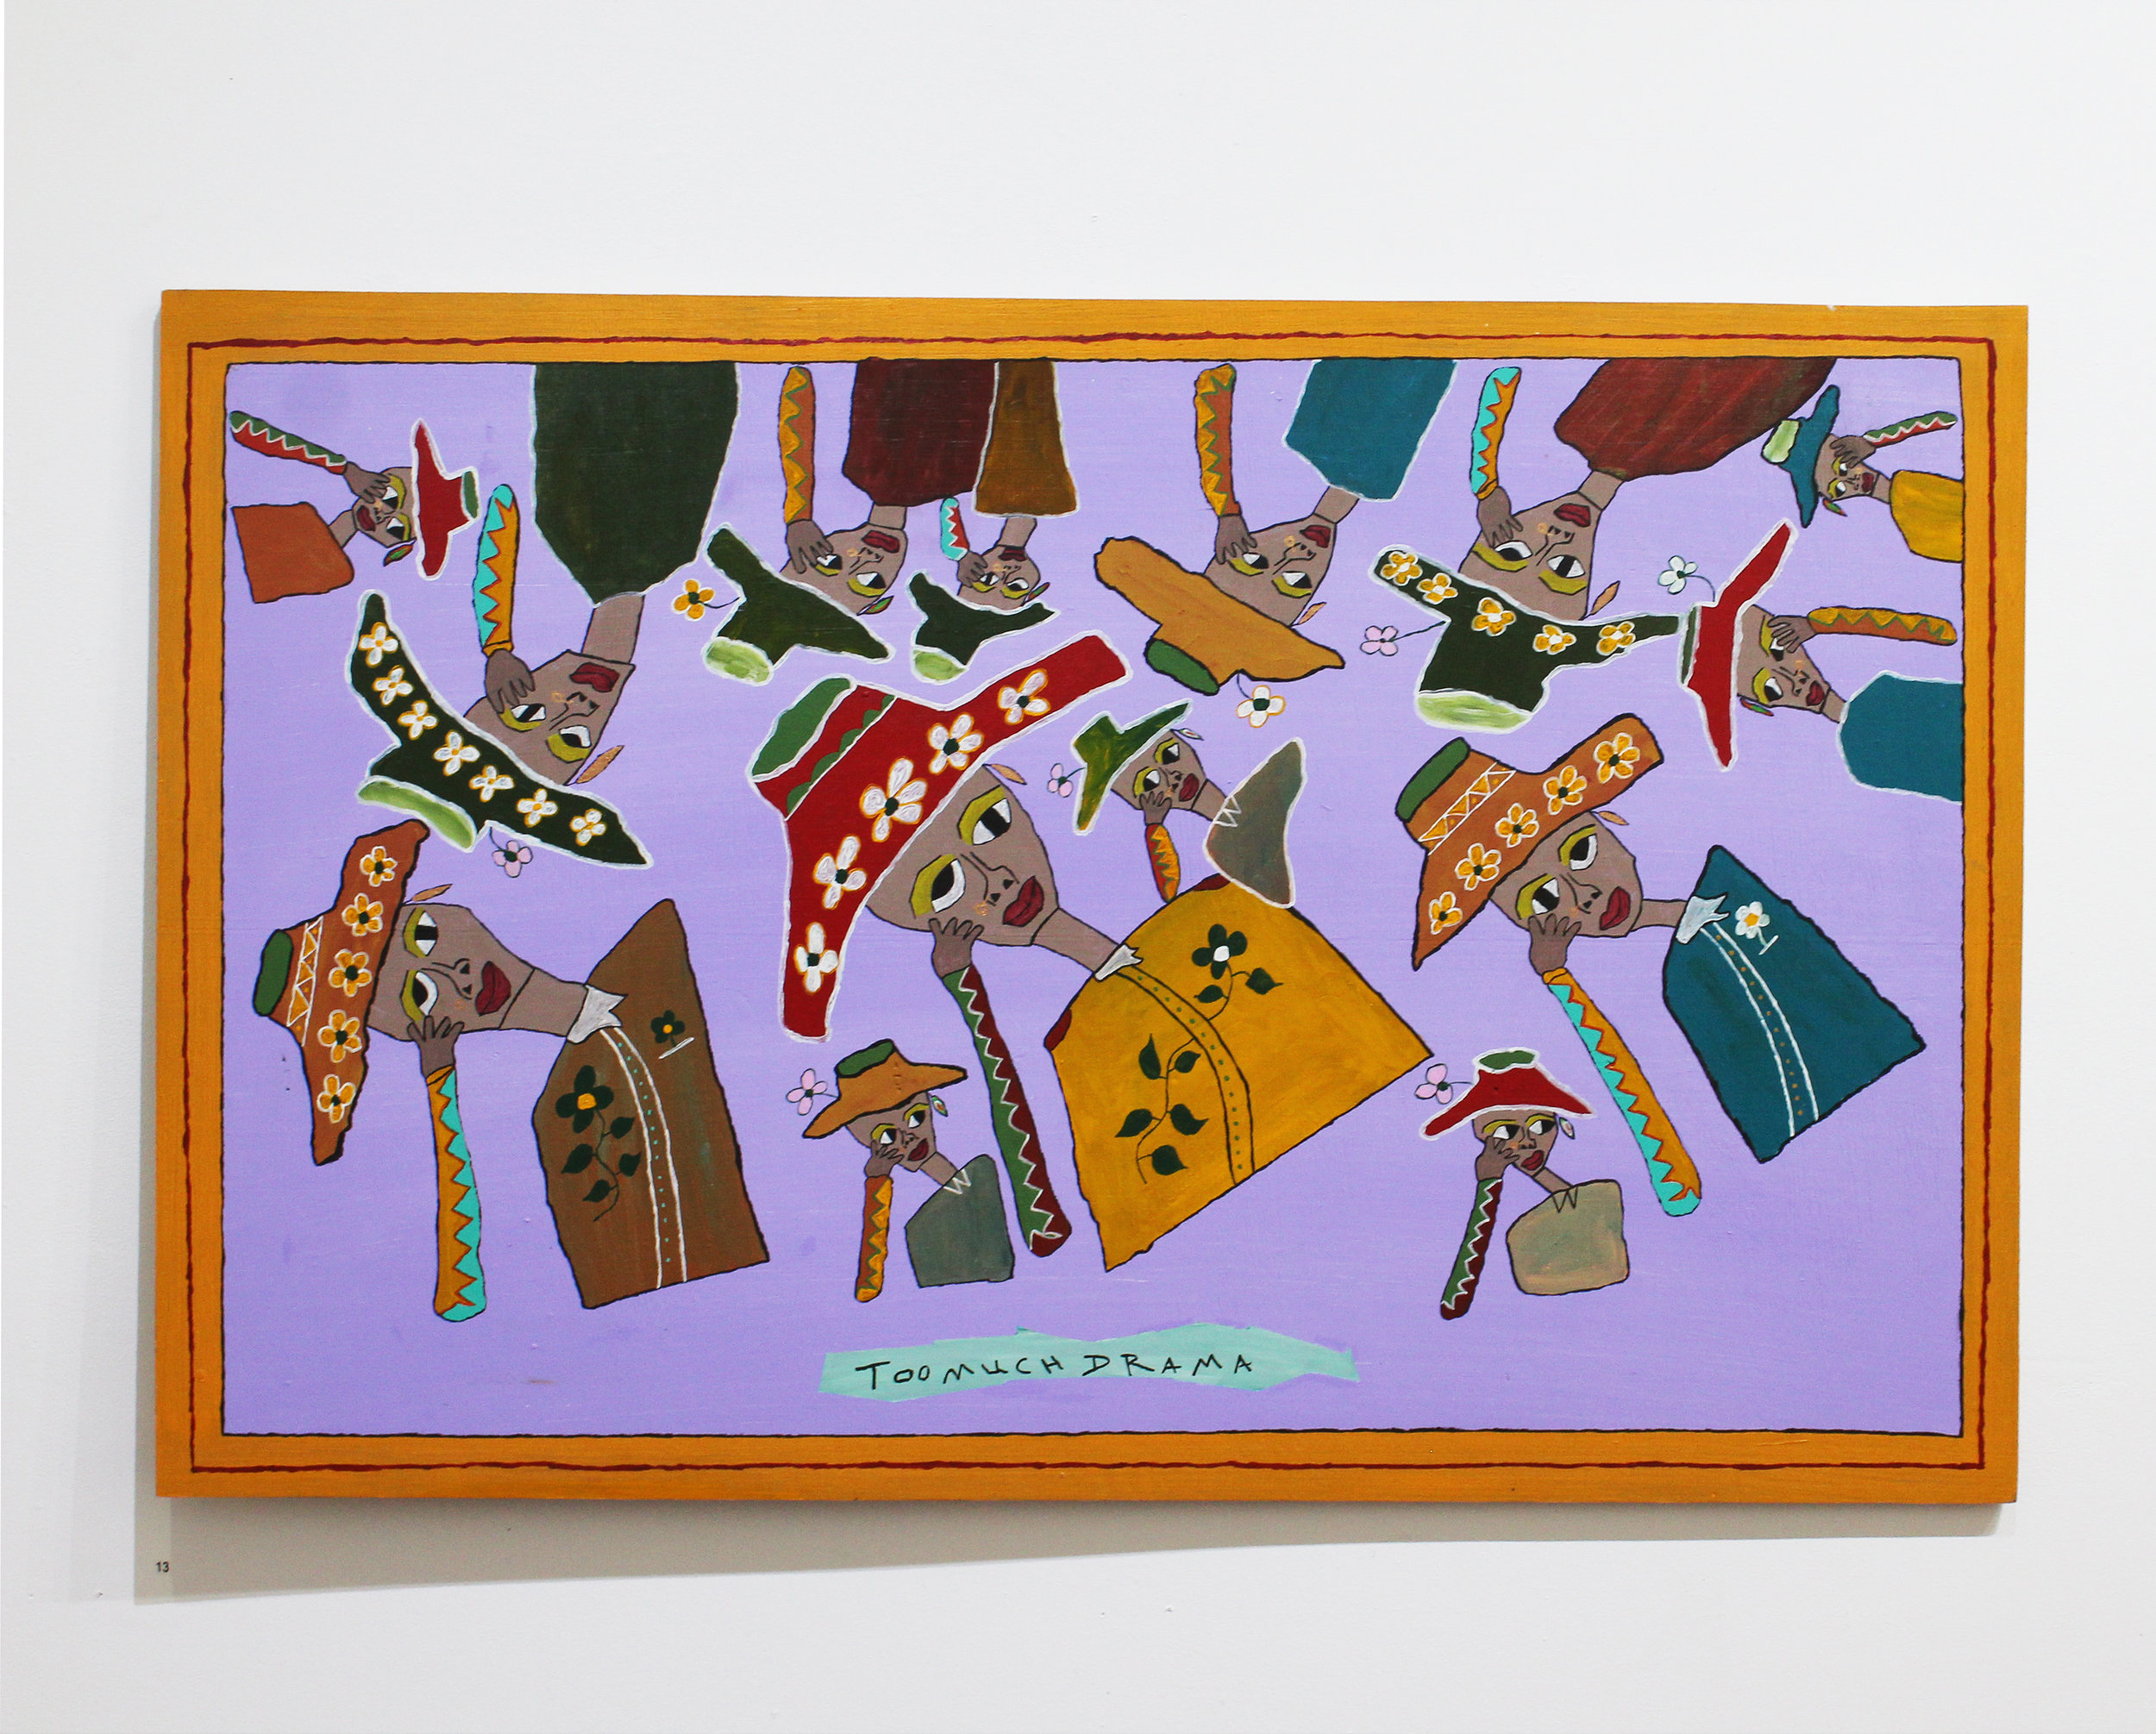 'Too Much Drama', Olana Janfa, acrylic on recycled timber, 80x120cm $1400